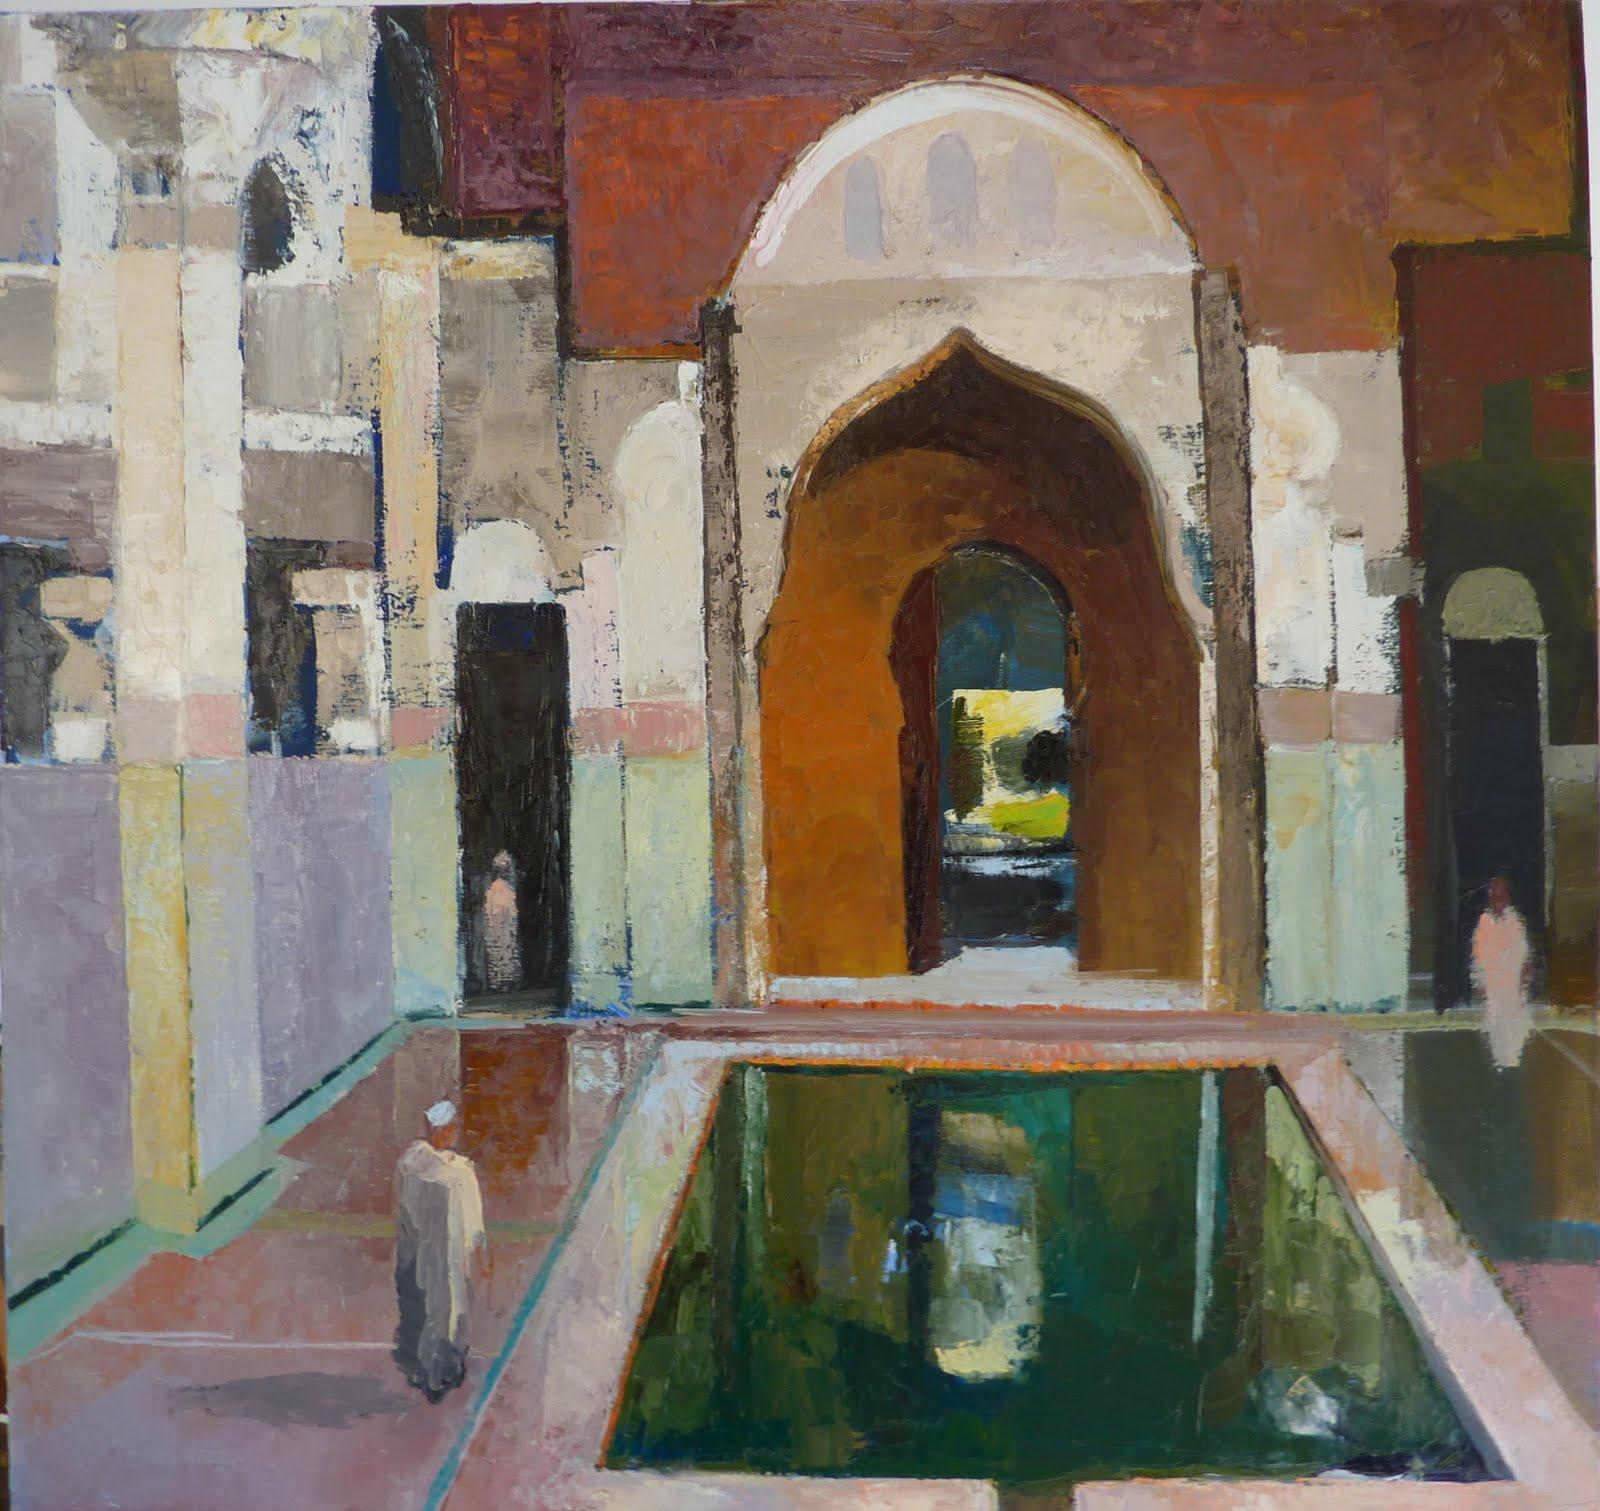 Peinture orientaliste interieur maroc for Peintre interieur